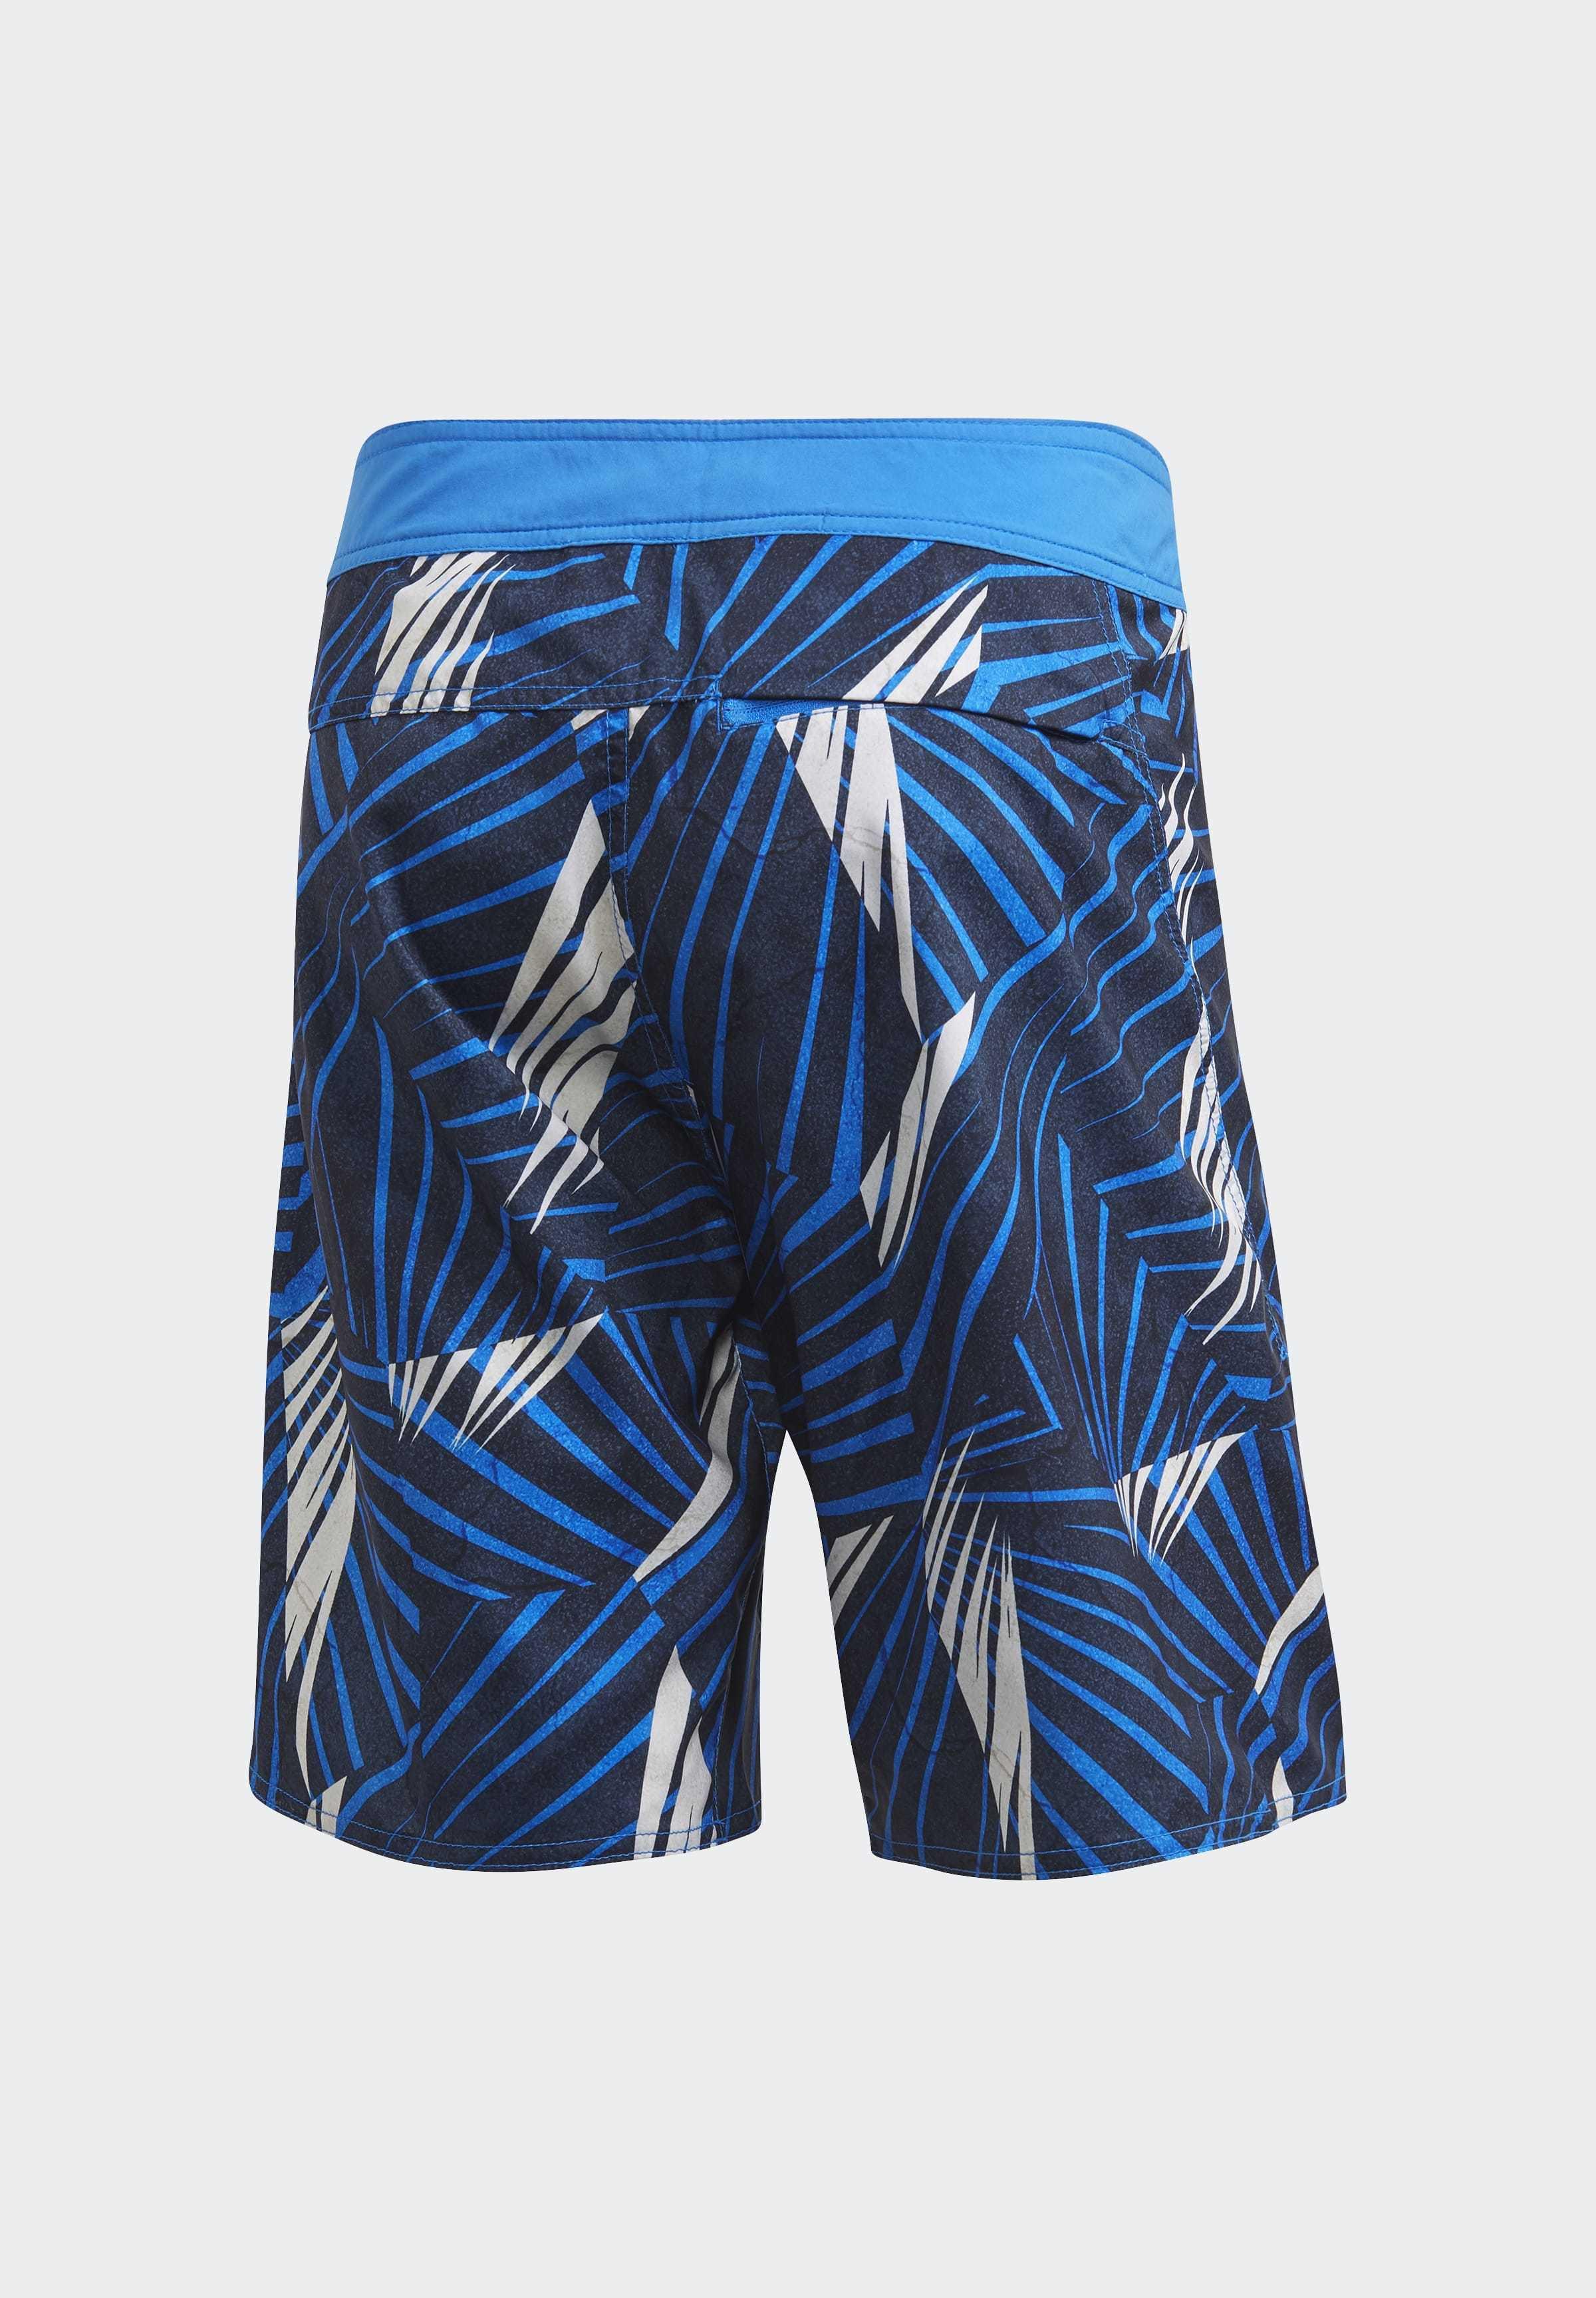 Adidas Performance Graphic Tech Swim Shorts - Blue